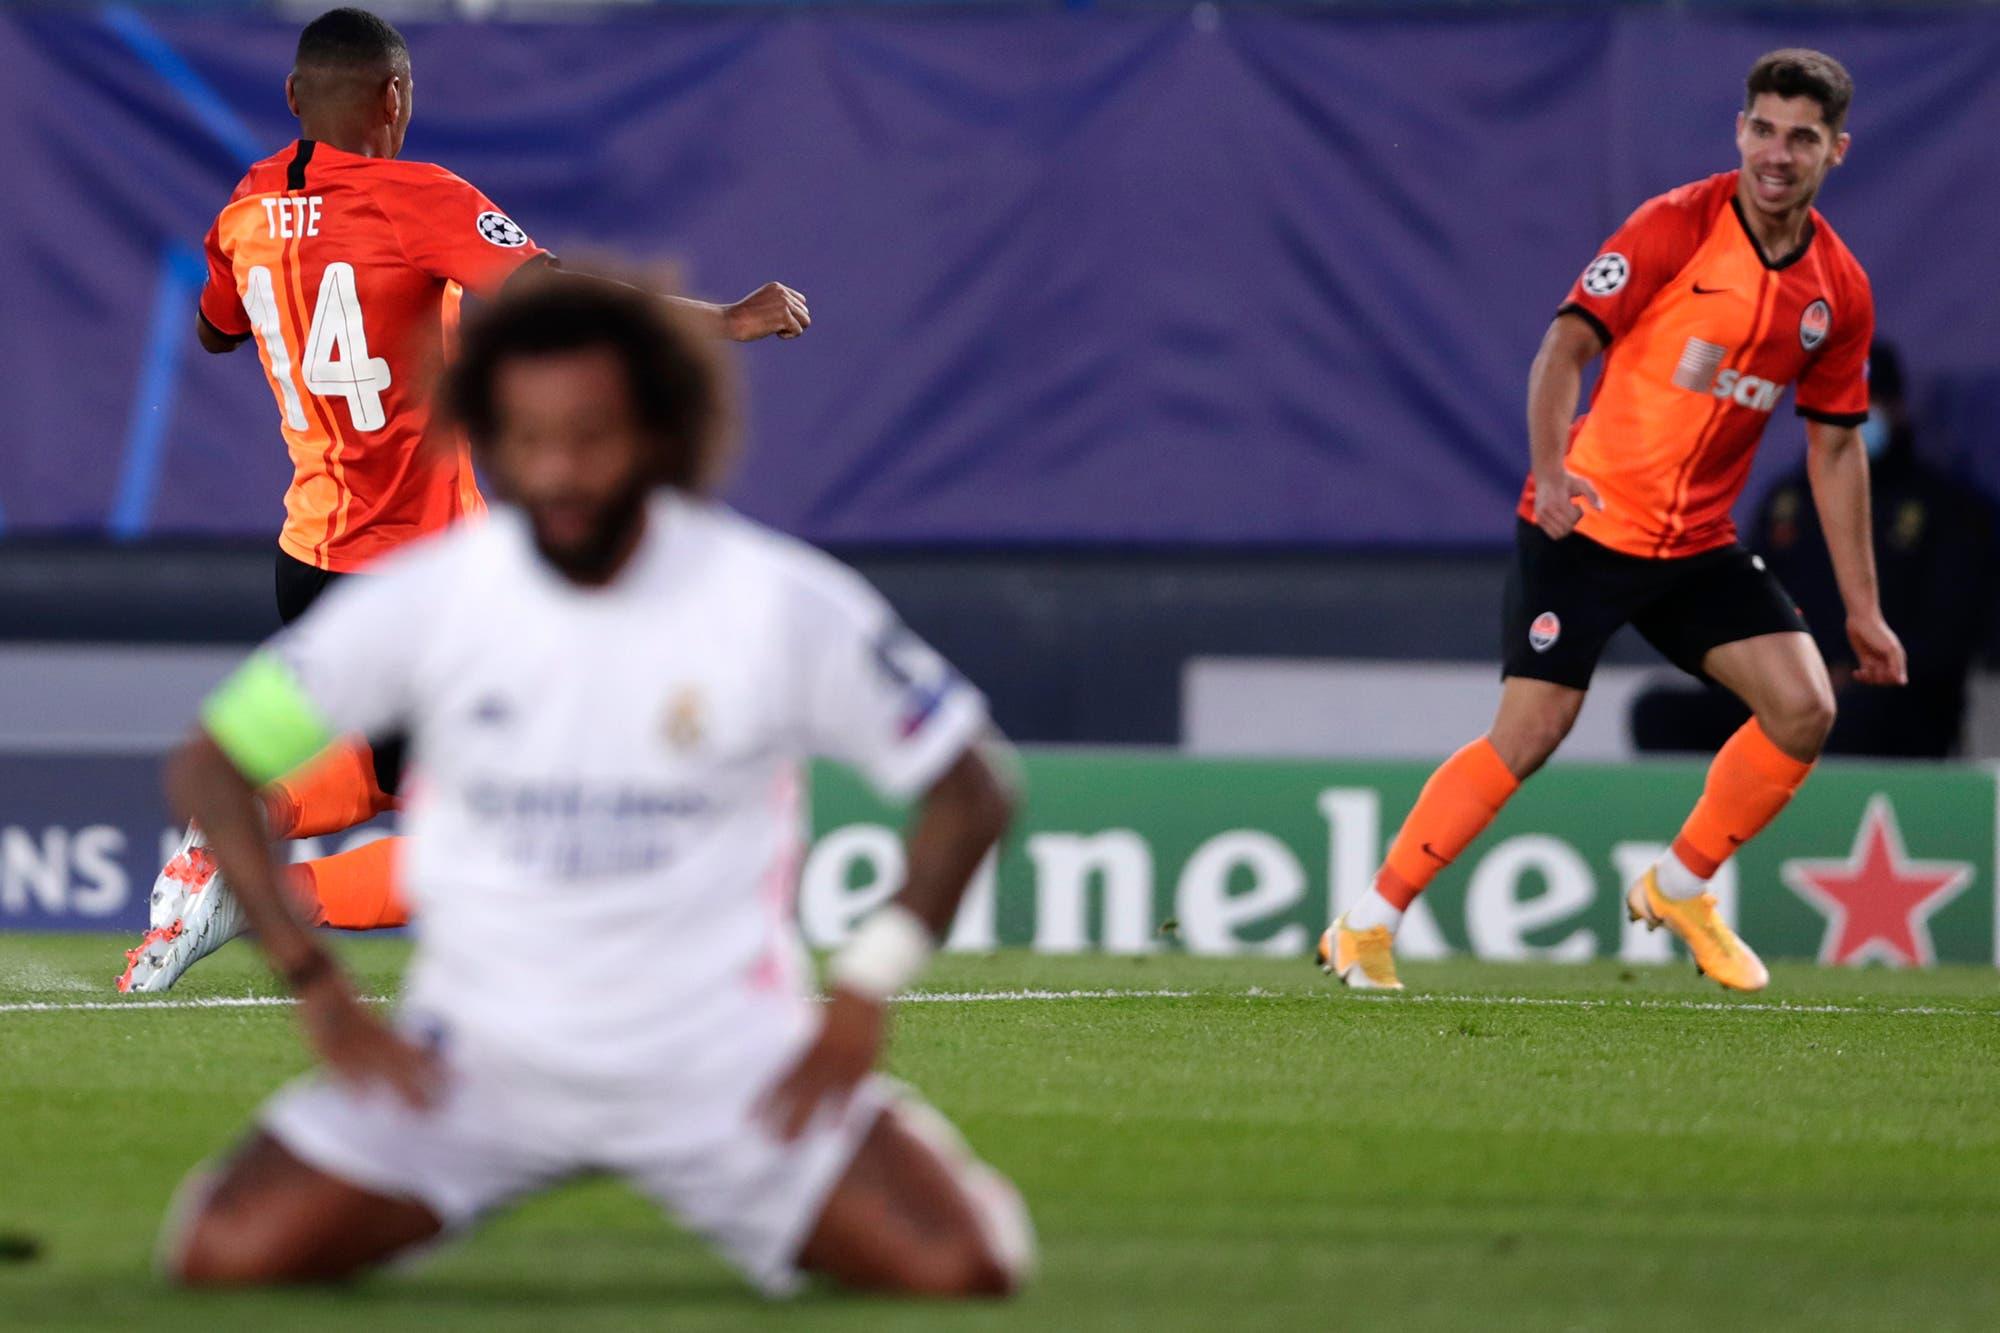 Real Madrid-Shakhtar: histórica derrota del Merengue en la Champions League frente a un rival con solo 13 profesionales